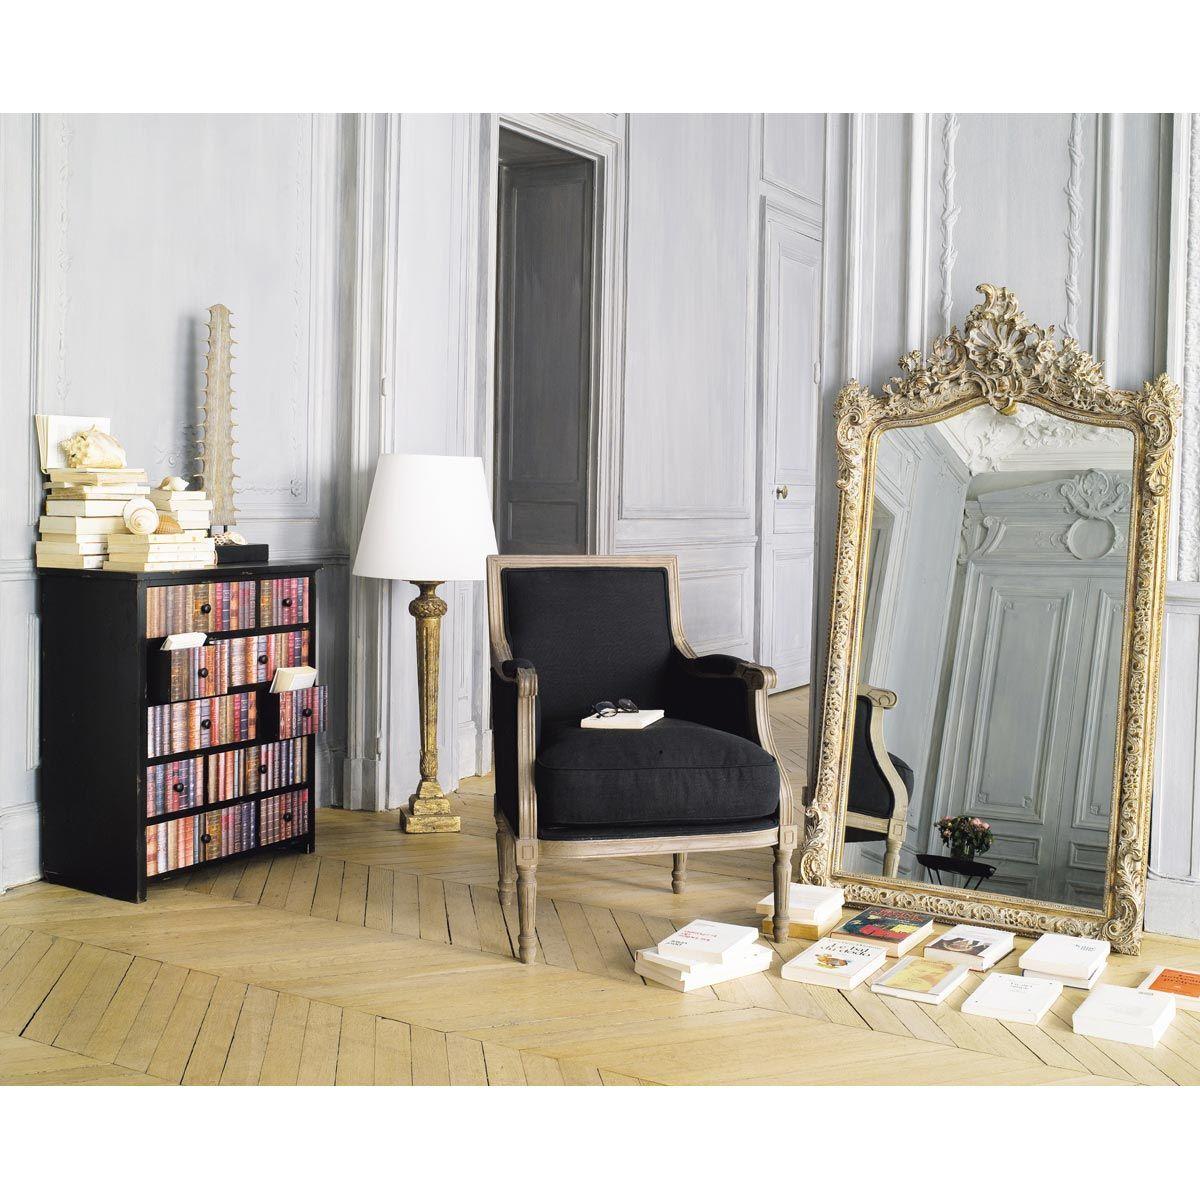 Conservatorium spiegel | Maisons du Monde